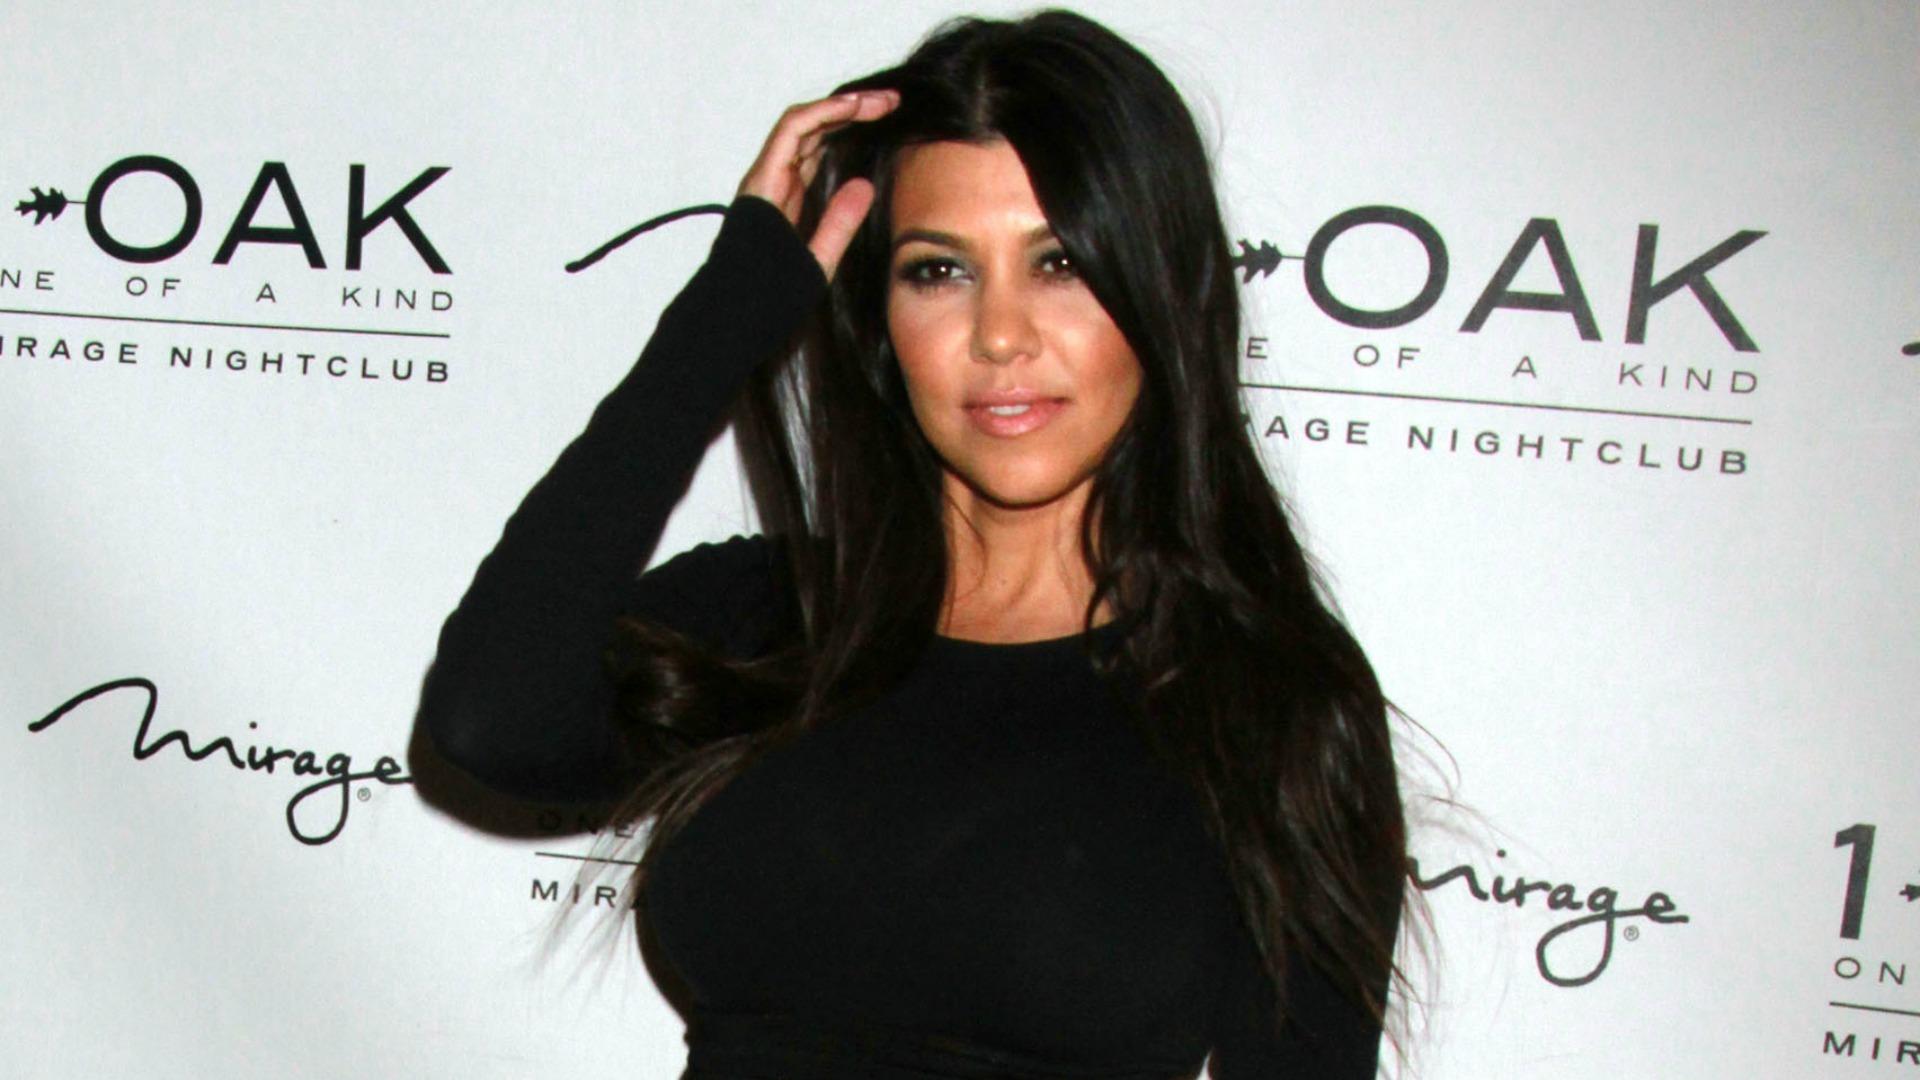 Kourtney Kardashian Shares Pumping Selfie